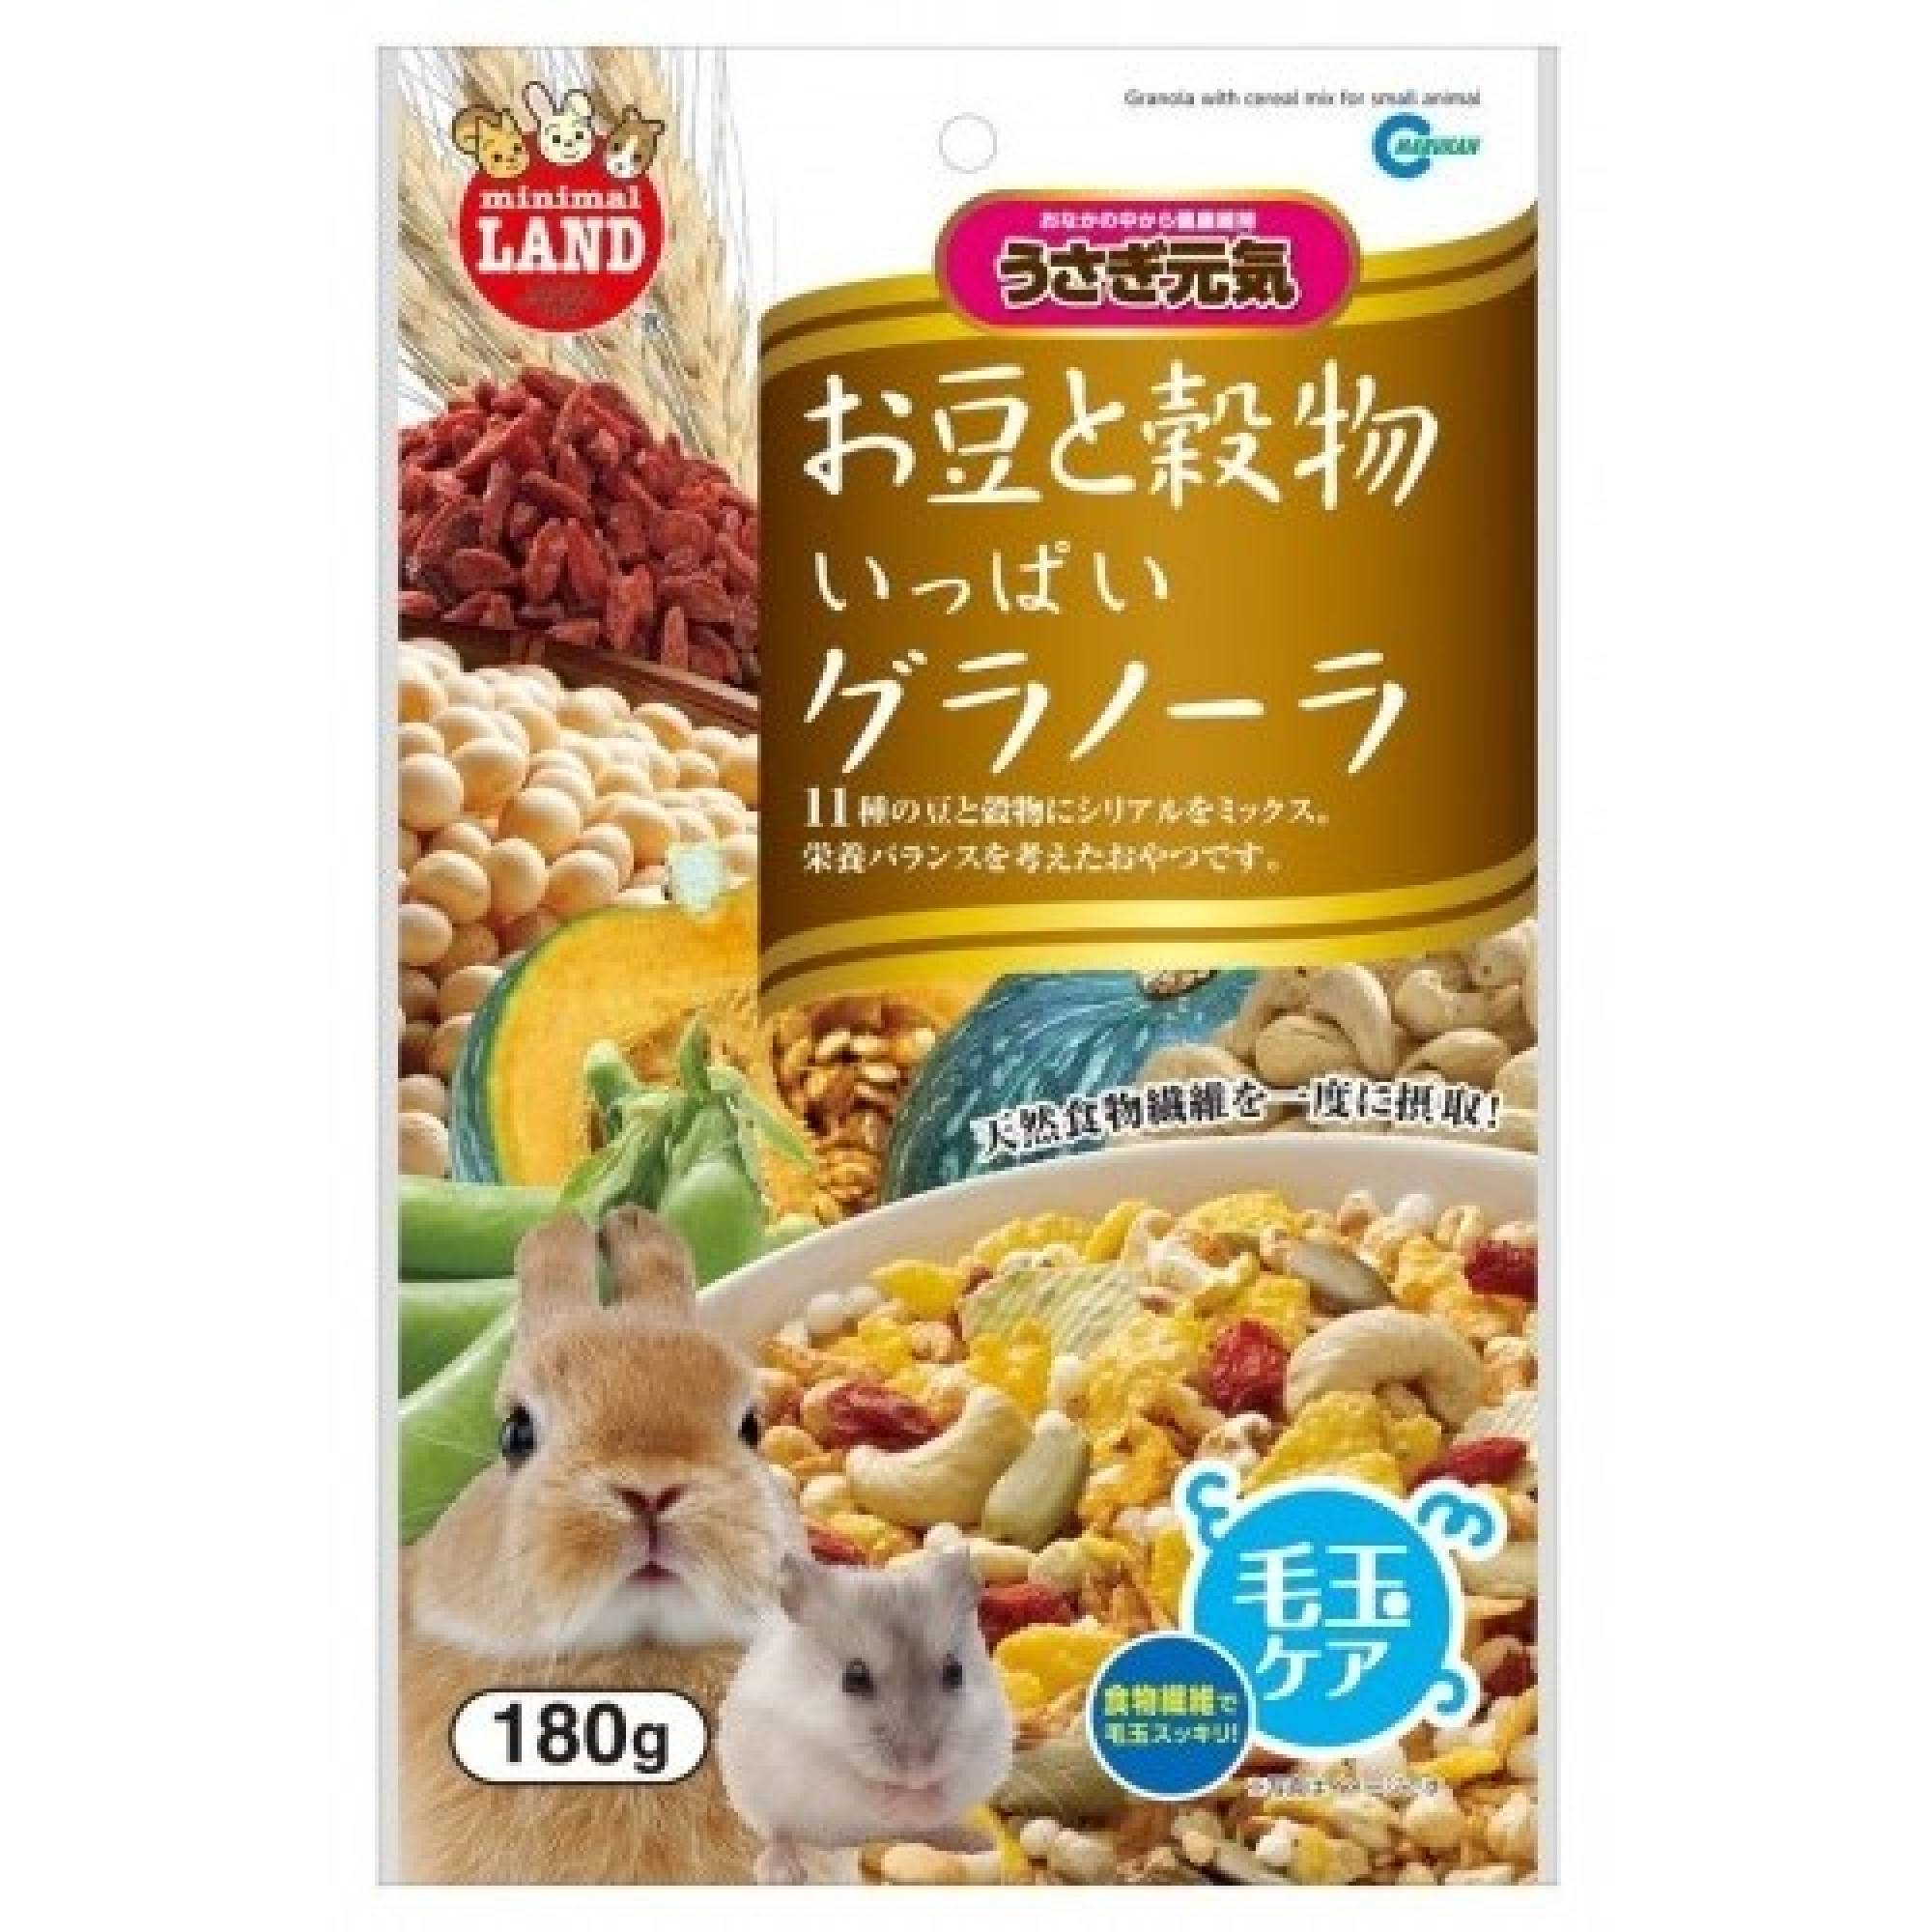 Marukan ML08 - Granola Cereal Mix 180g